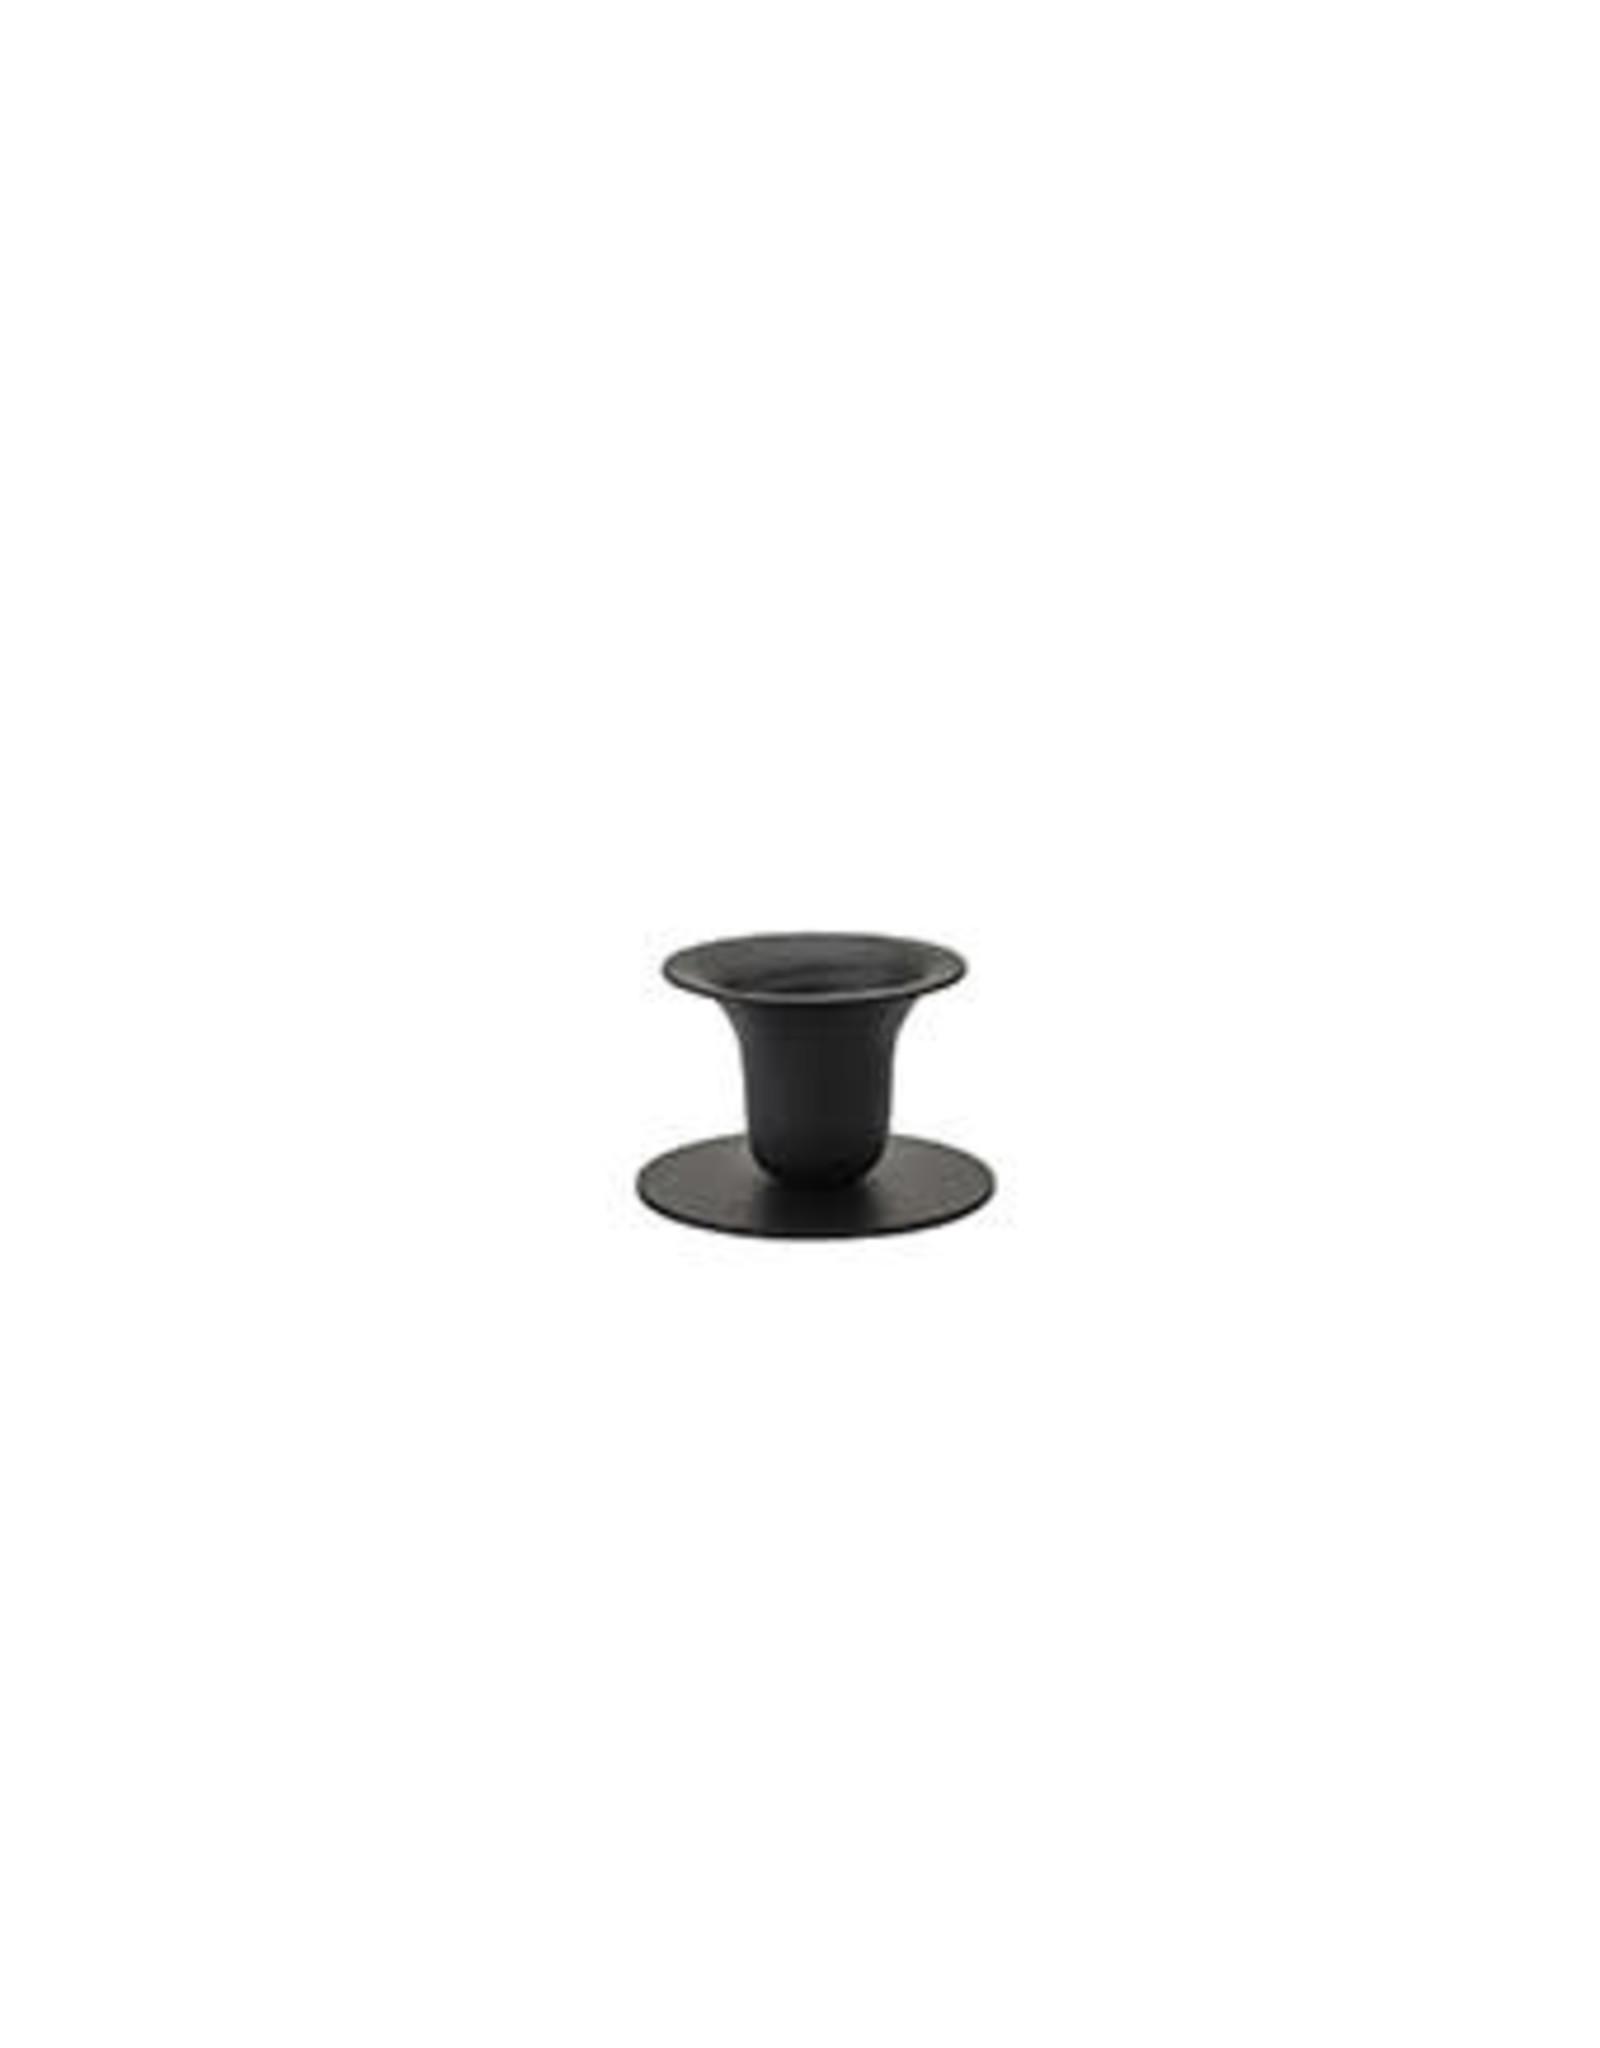 Kunst industrien The Bell Candlestick, Rustic Black  | H 5cm dia 2,3cm